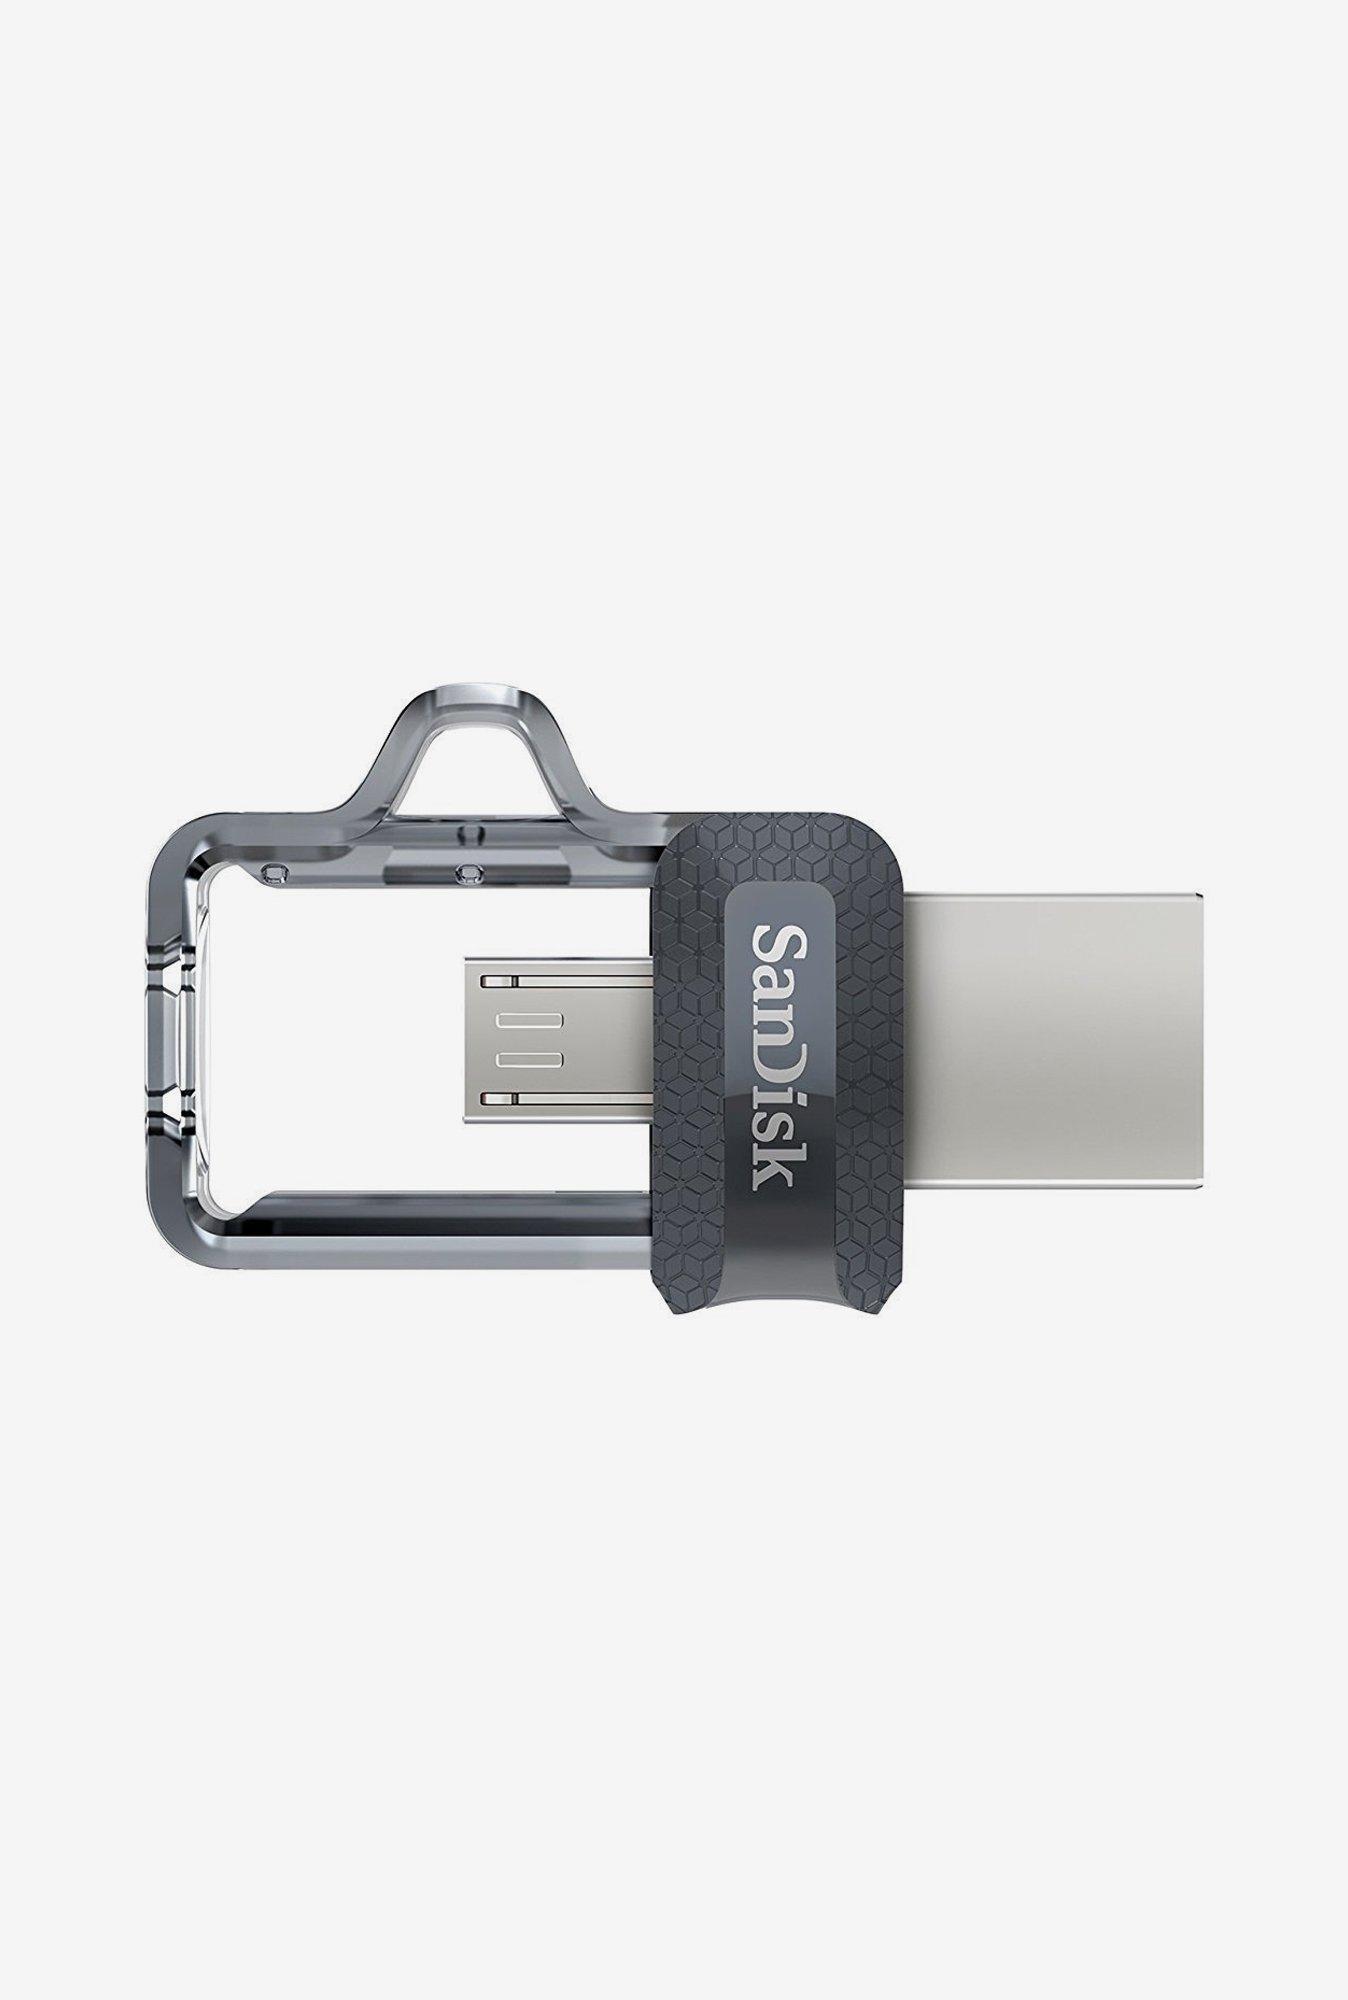 Sandisk Ultra Dual Drive M3 16GB OTG Pendrive